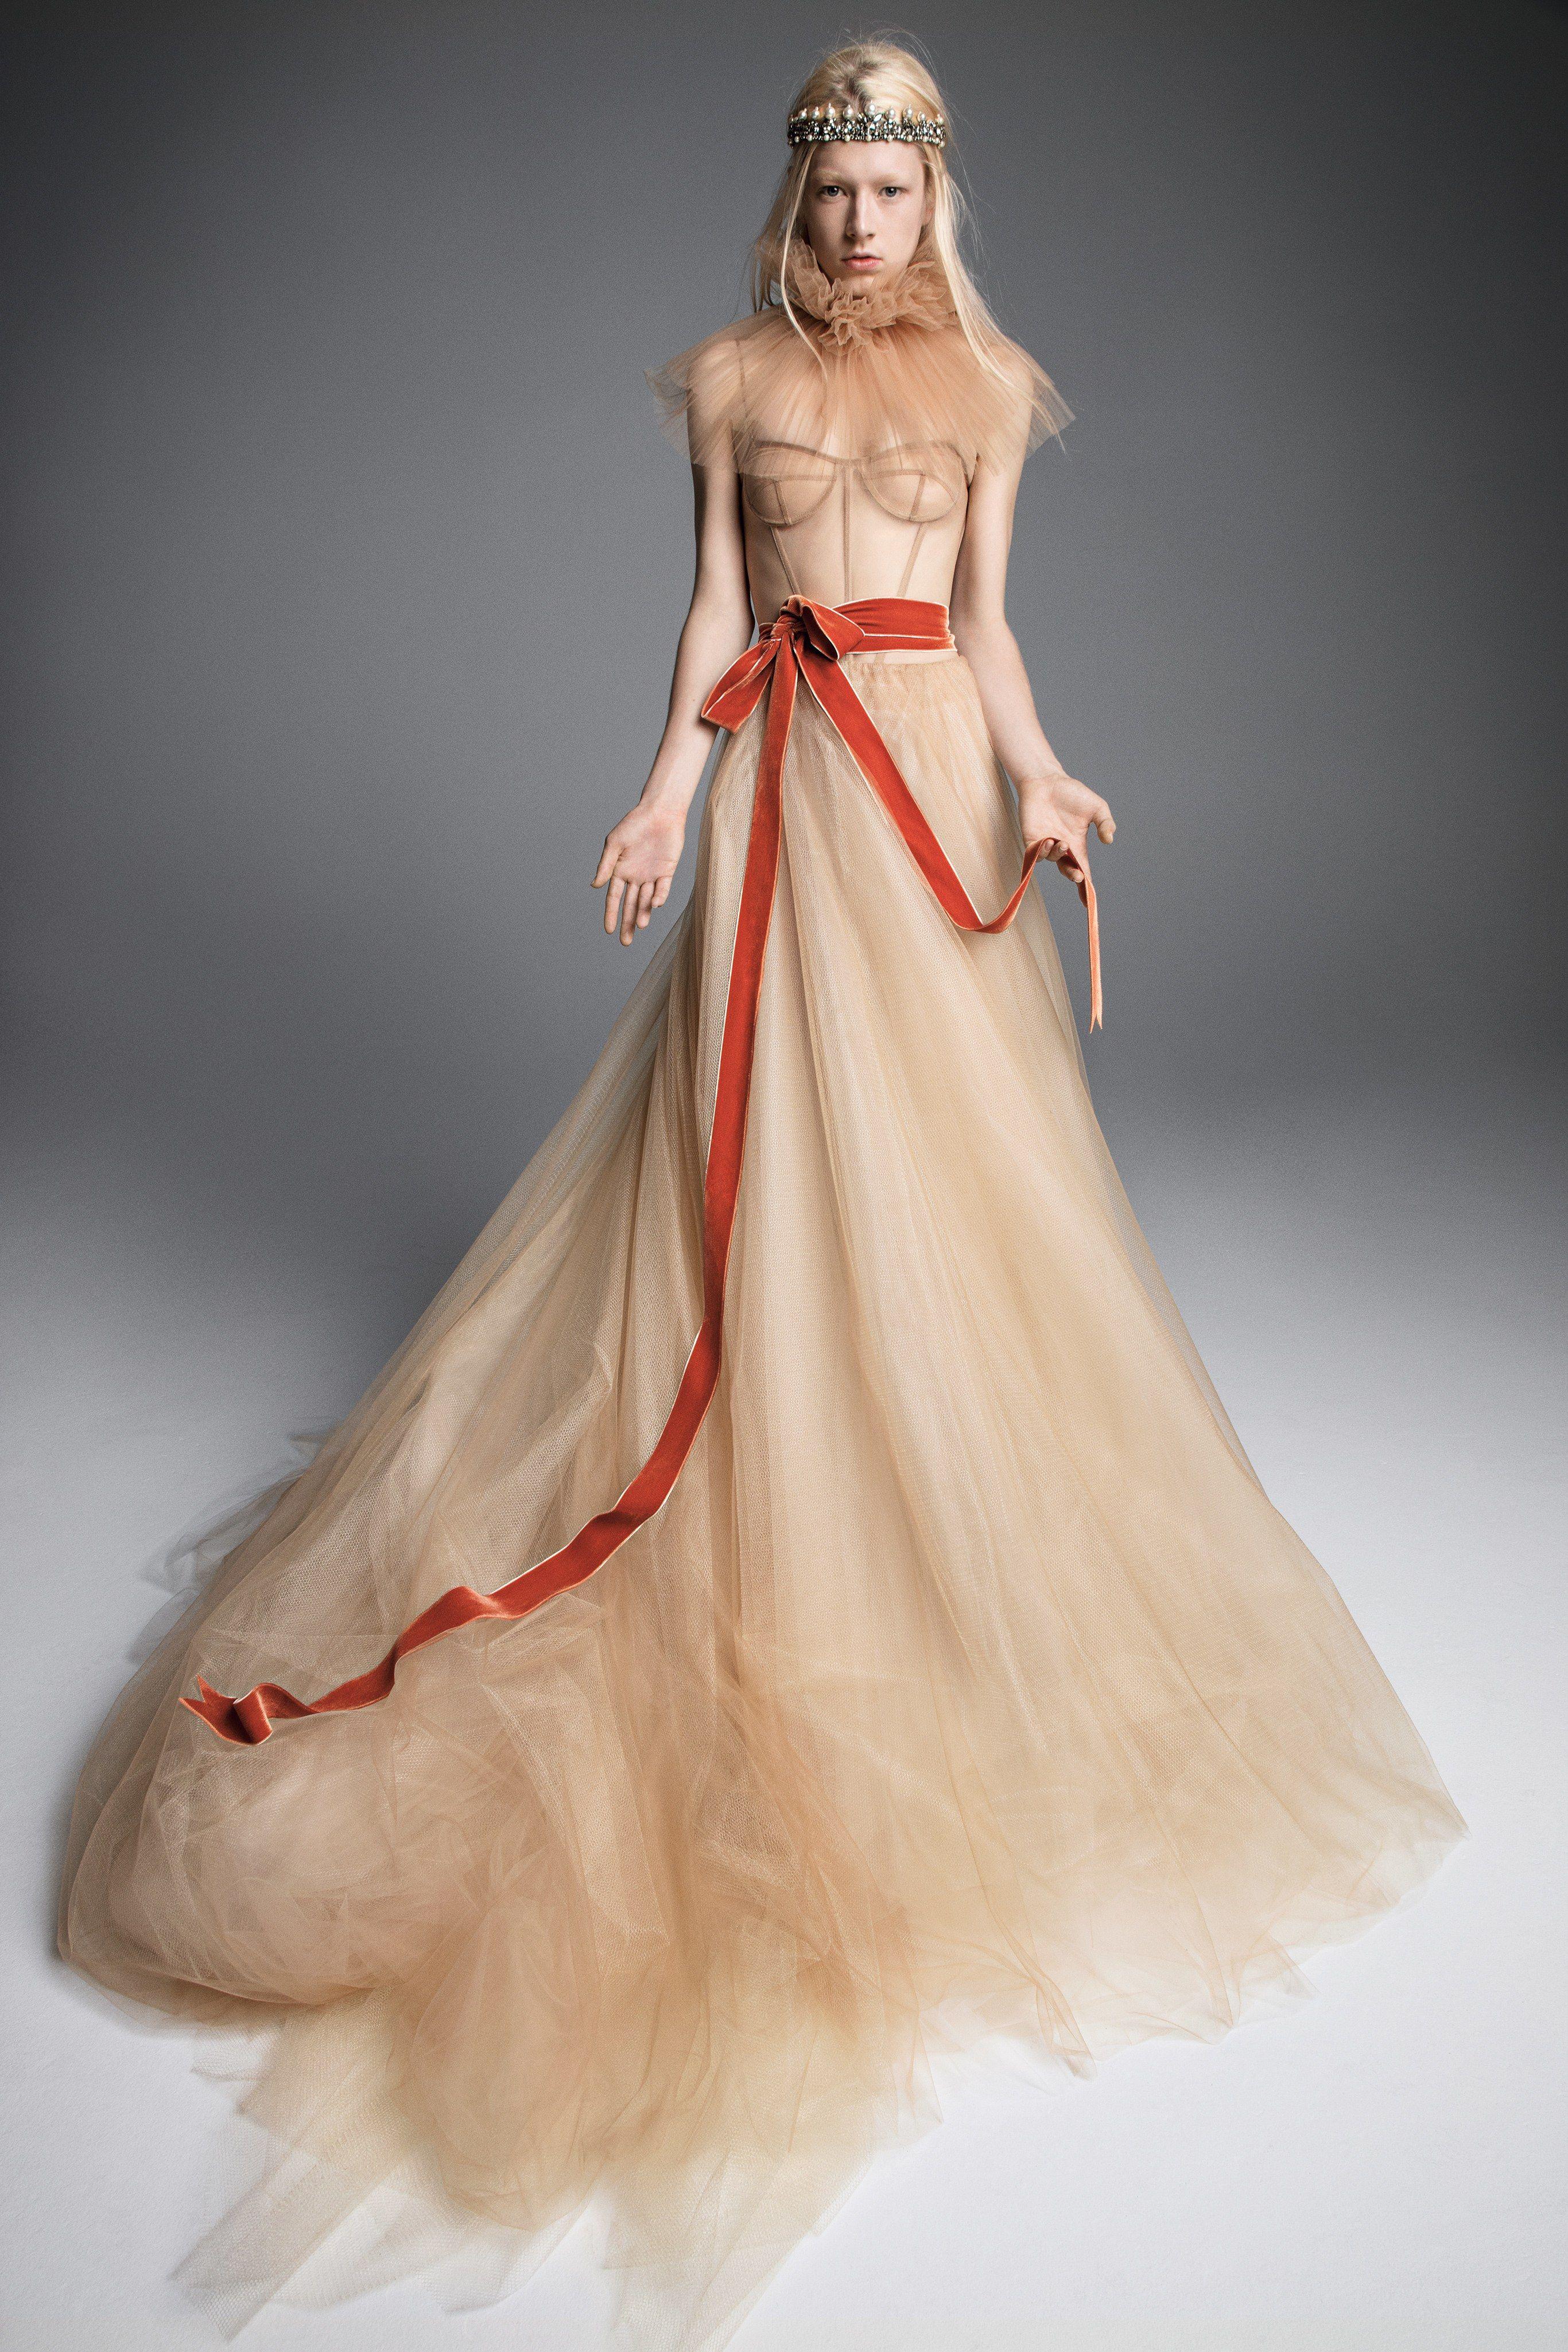 a0d2b481e0428 80+ Best Wedding Dresses Fall 2019 - Top Autumn Bridal Runway Looks